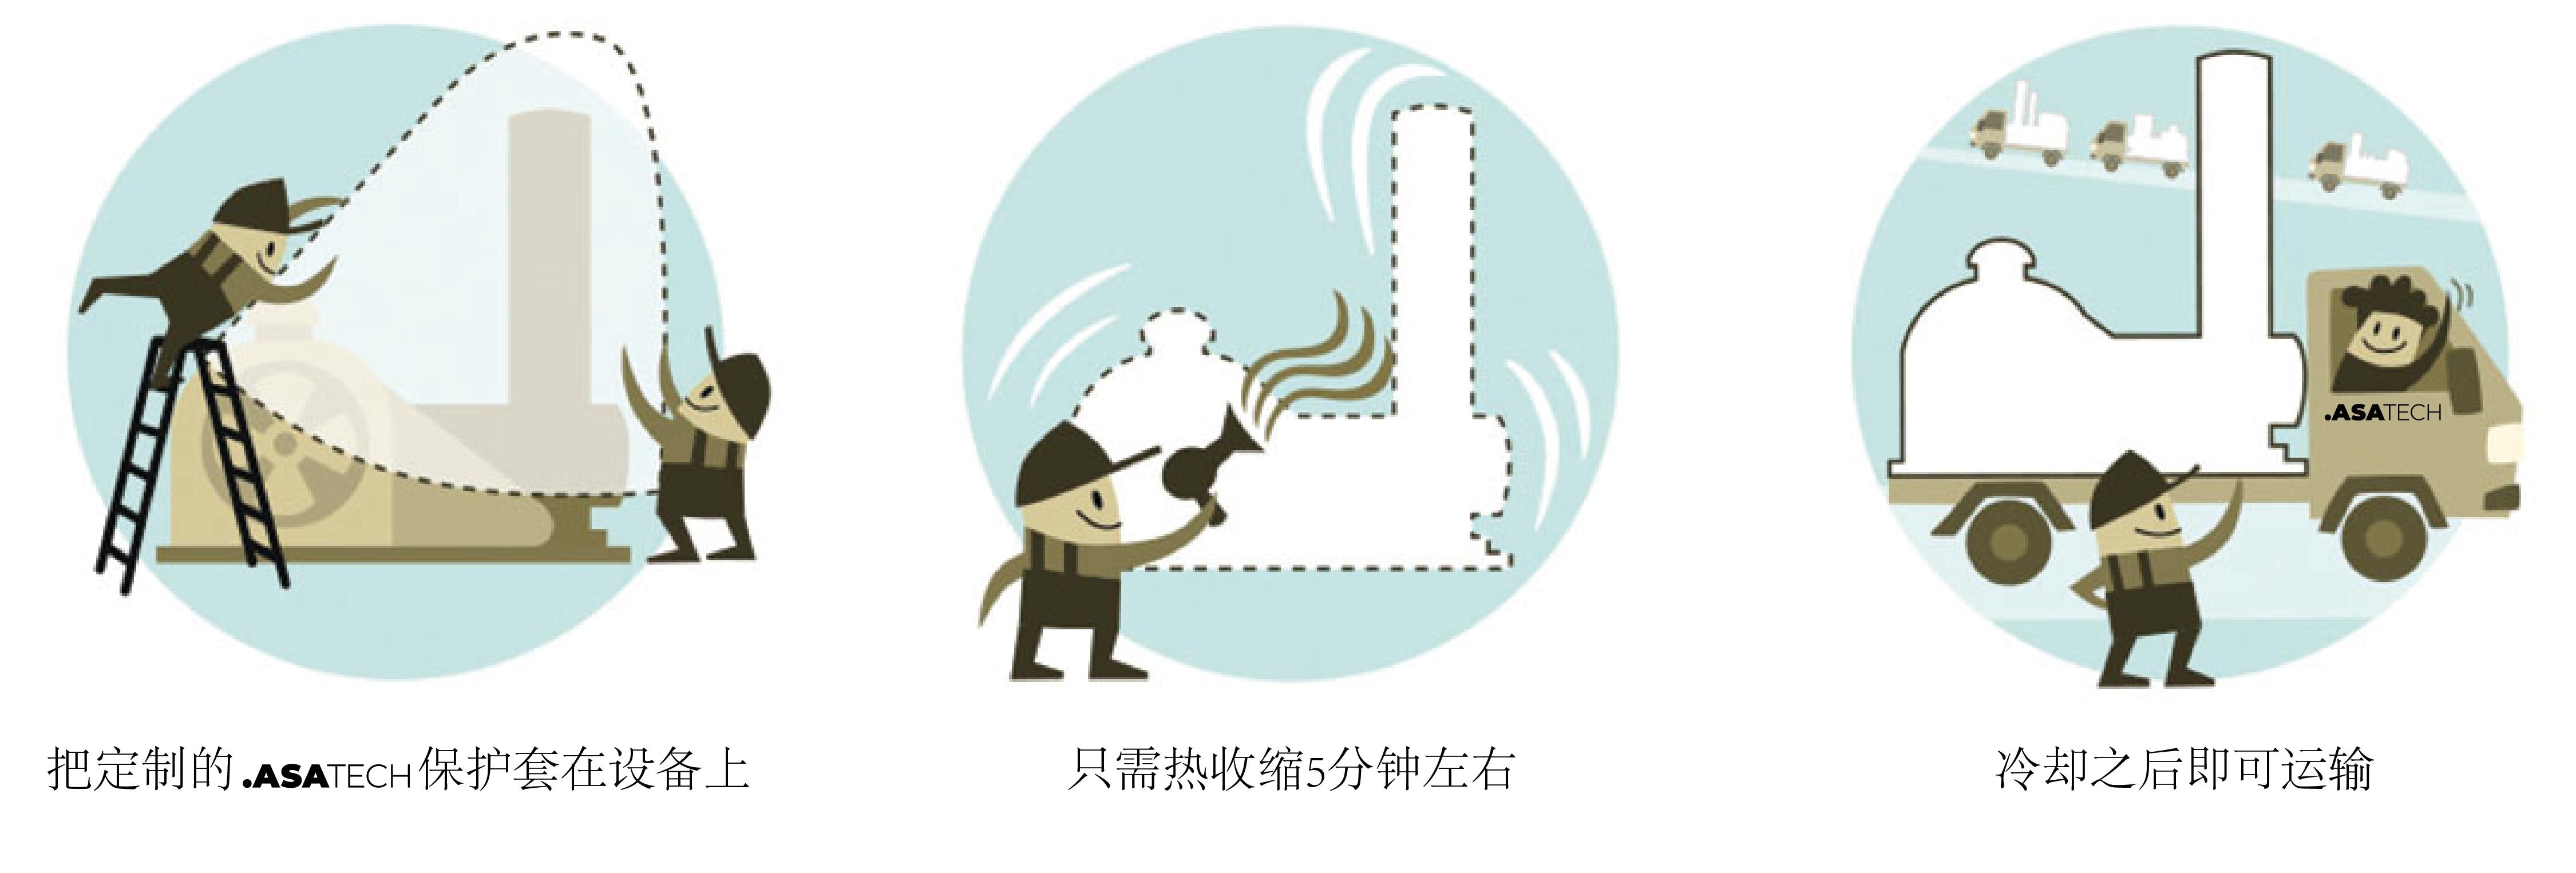 2019.07.04 ASATECH Cover process CHI web